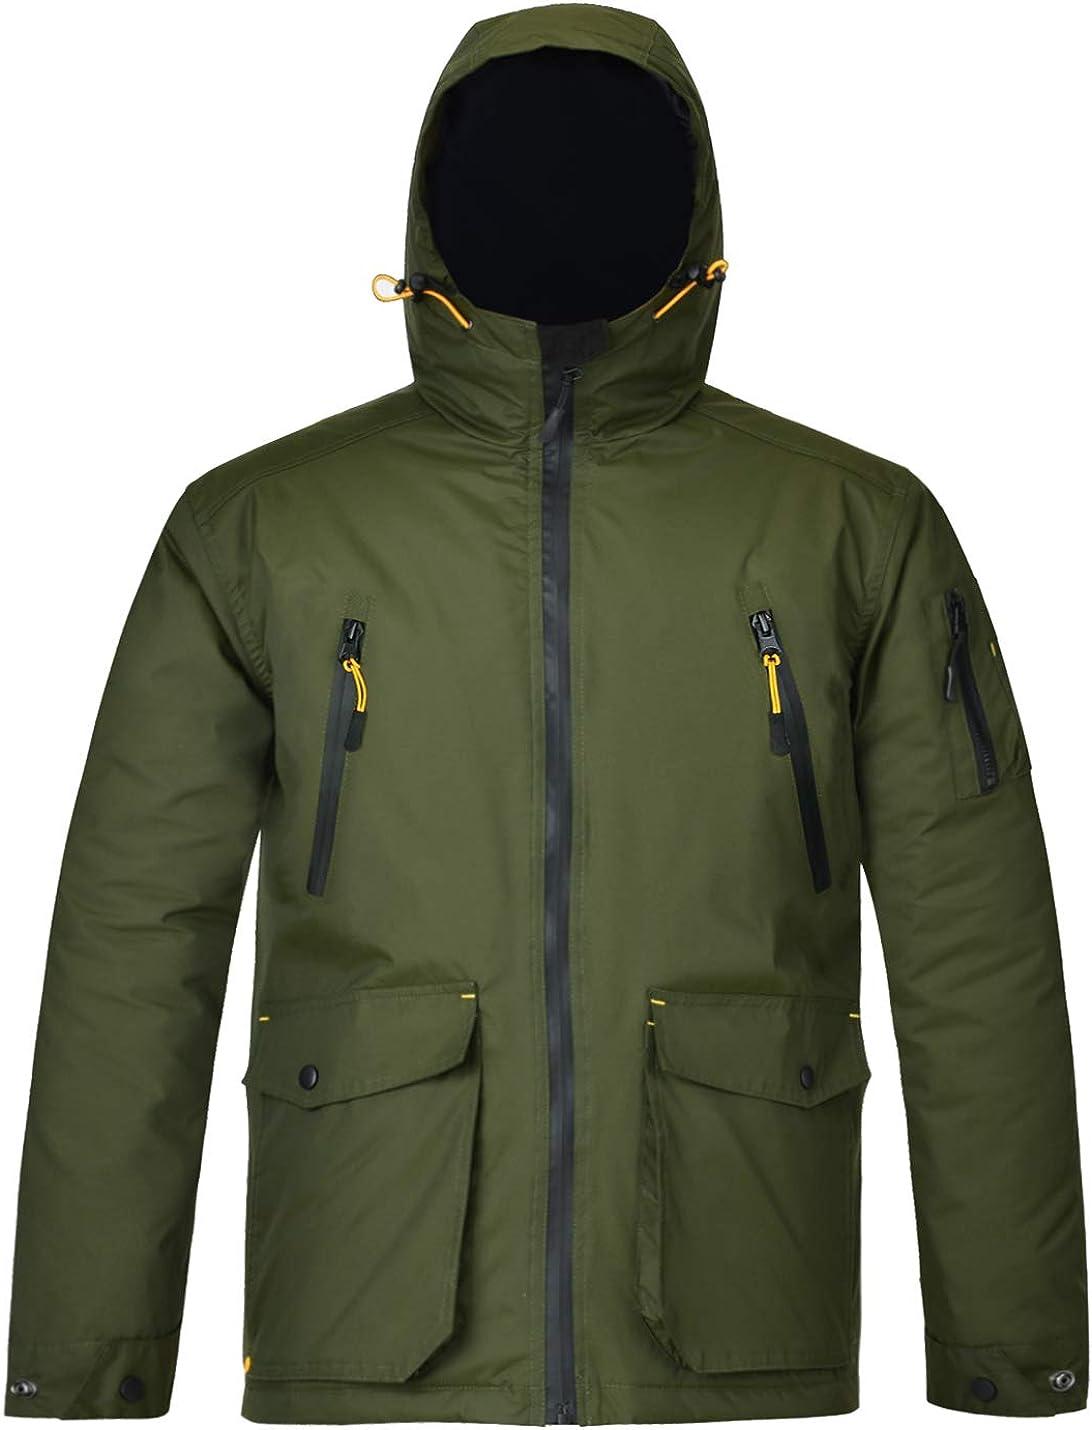 HARD LAND Men's Winter Work Jacket Waterproof Hooded Insulated Coat Parka Outerwear